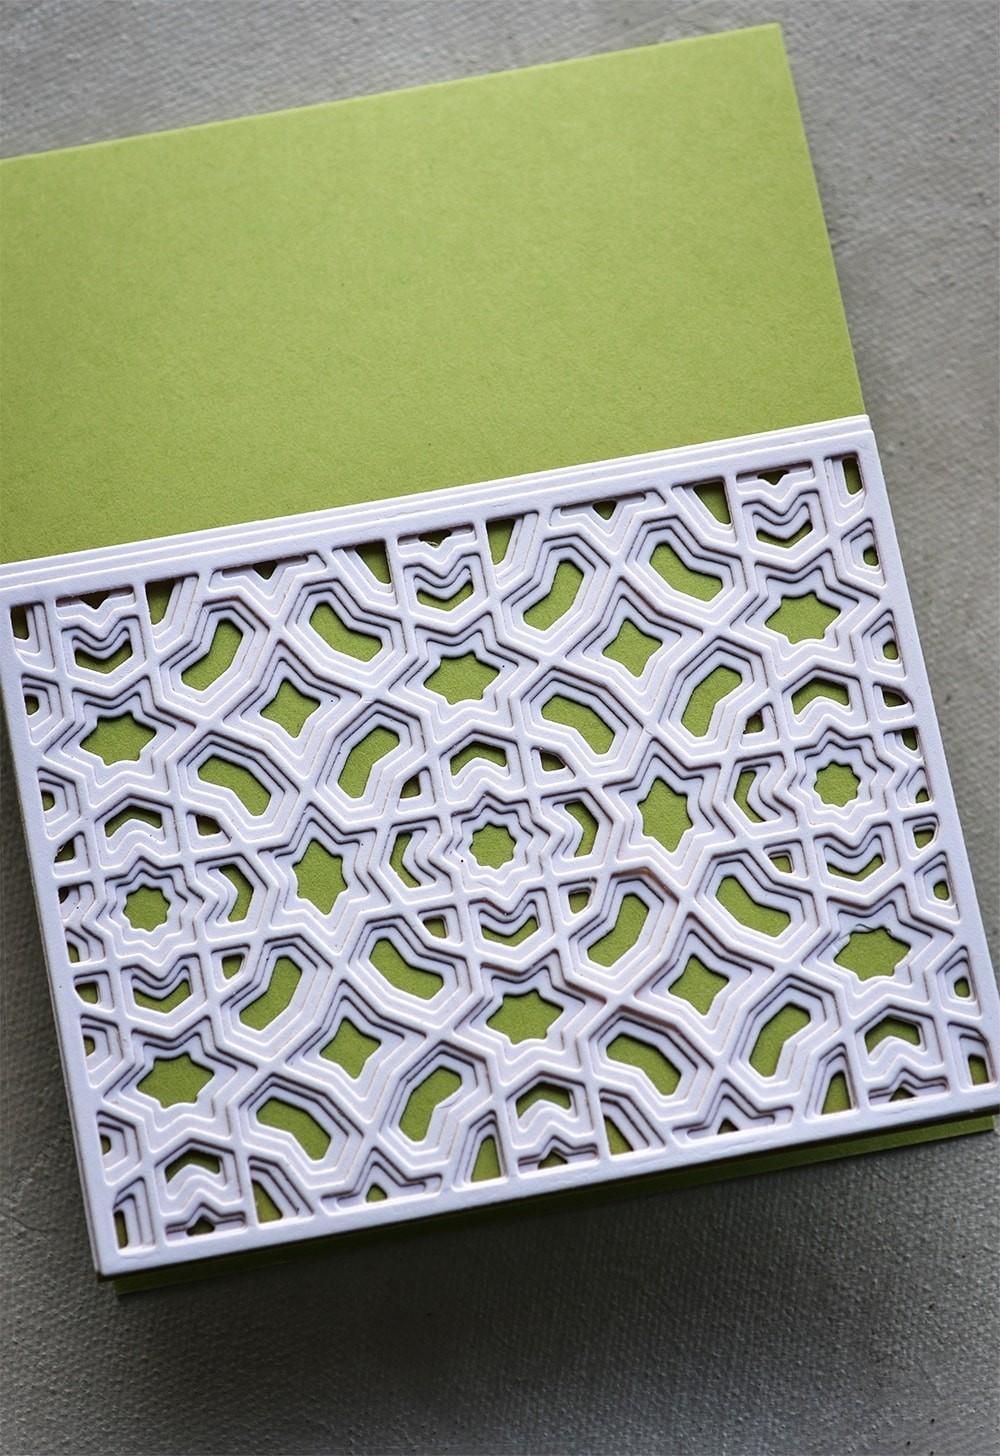 Birch Press Grandiose Bevel Plate Layer Set 56102